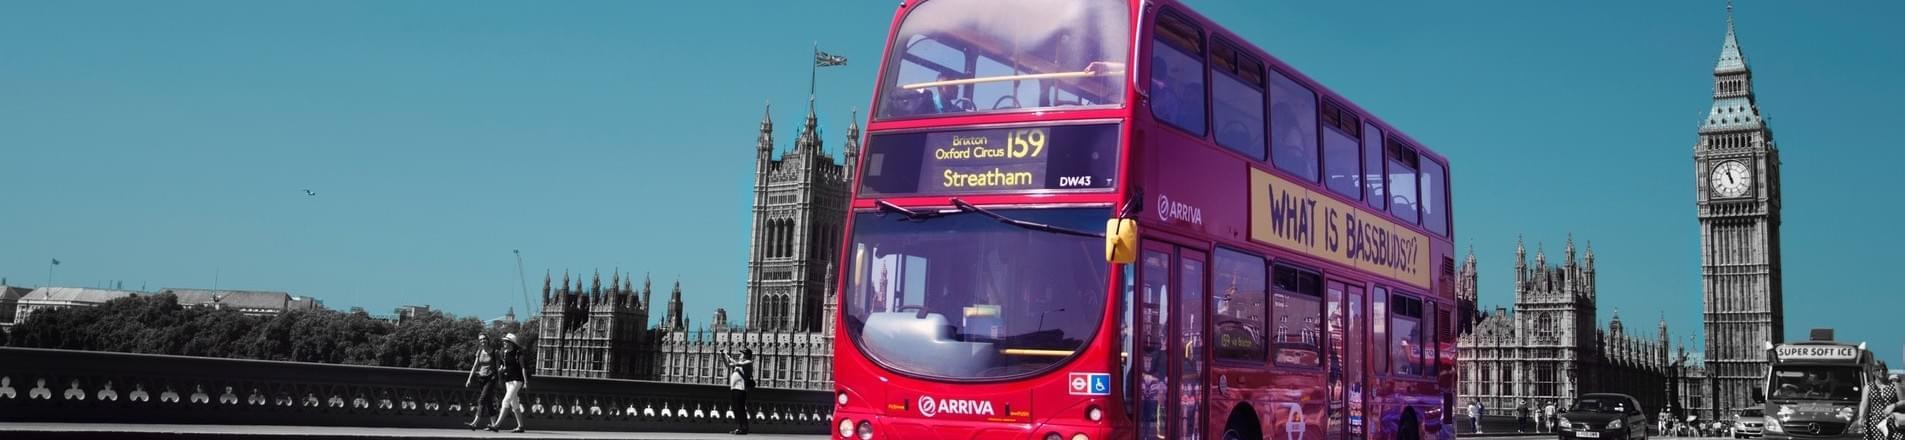 Atkins: Diversity matters in transportation